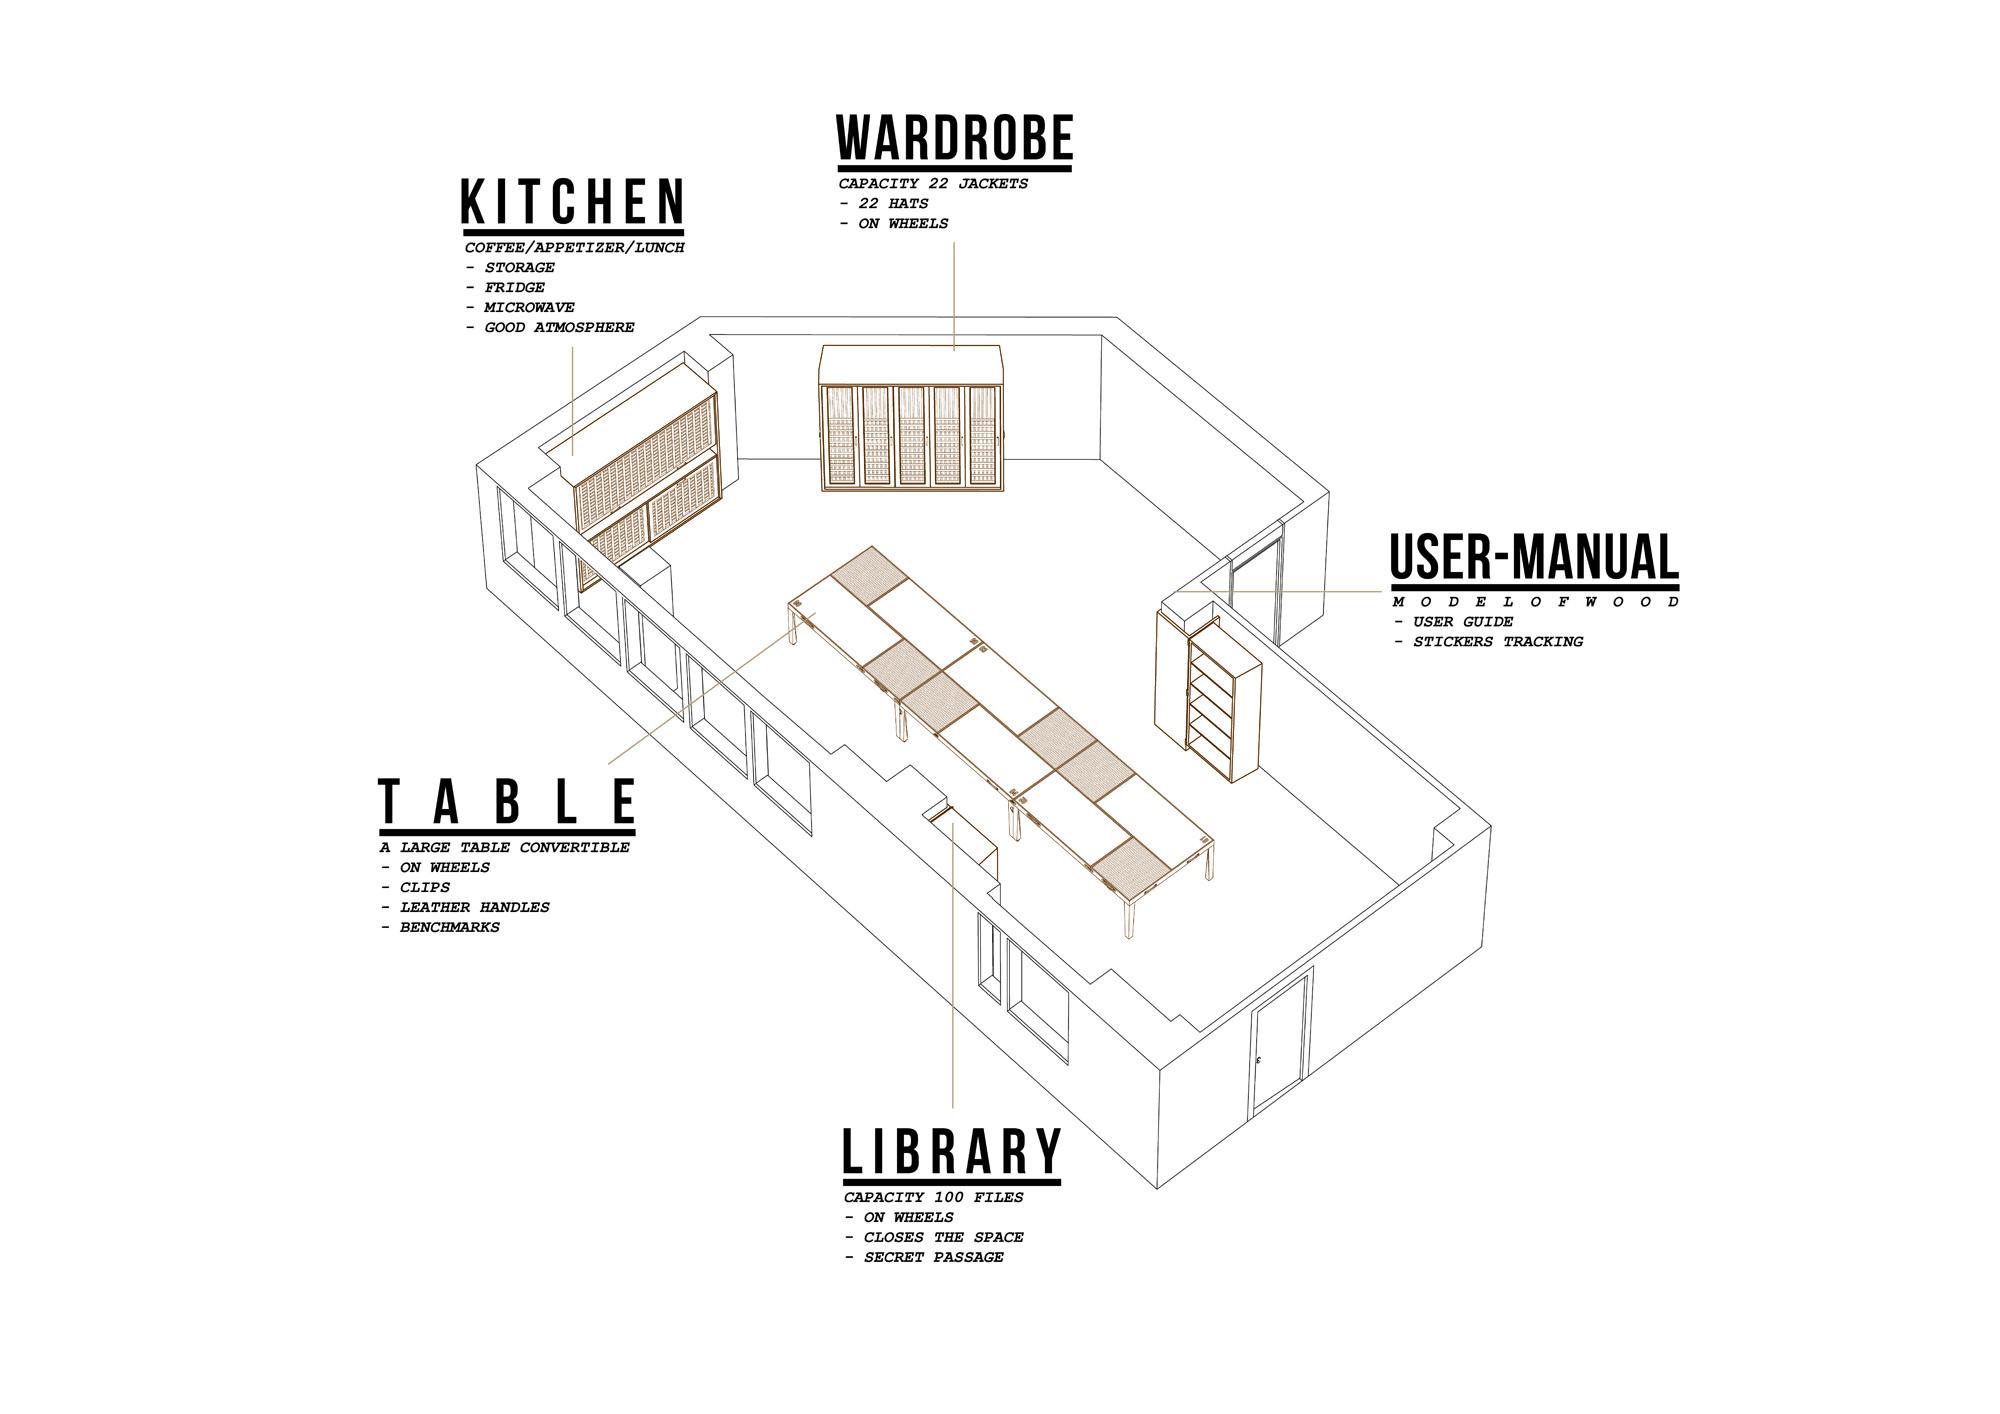 Serie «1 Table - 6 Layouts» / LES ATELIERS TRISTAN & SAGITTA